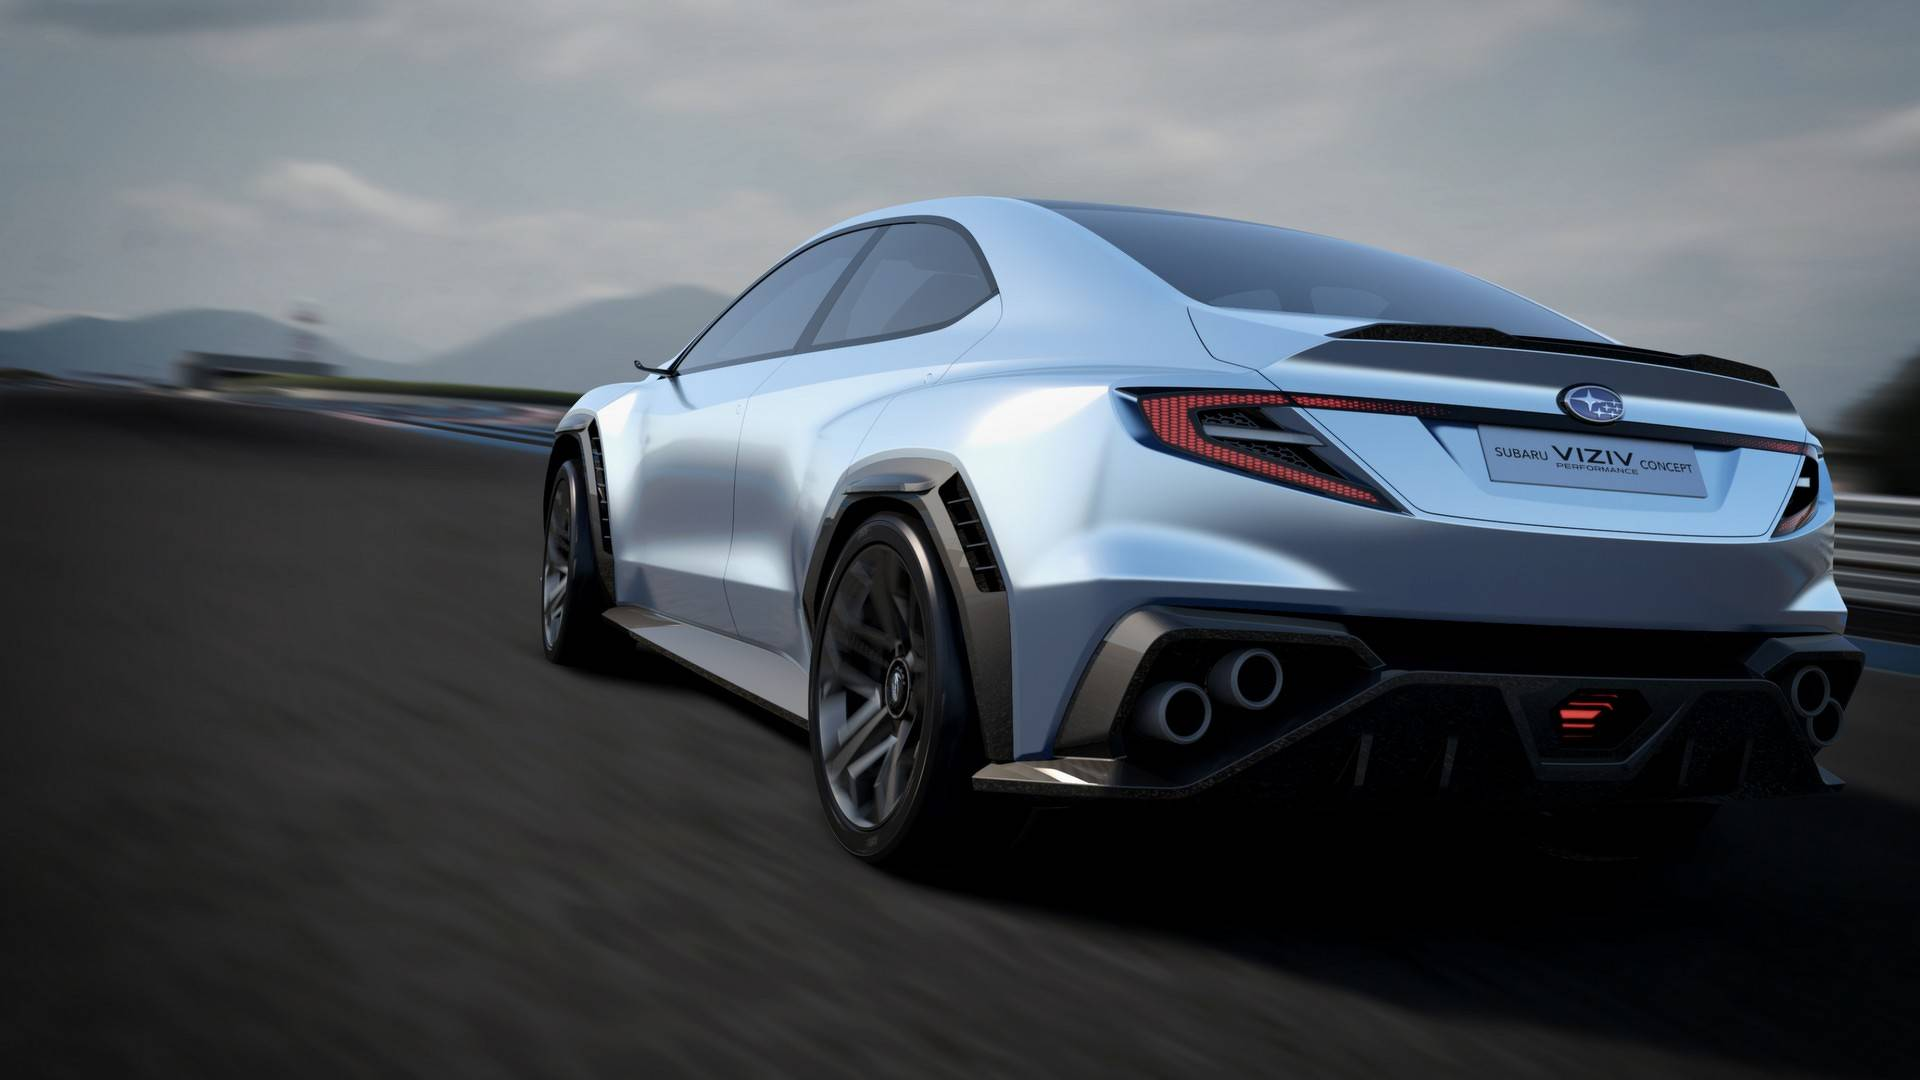 2022 subaru wrx sti expected with fa24 24liter turbo